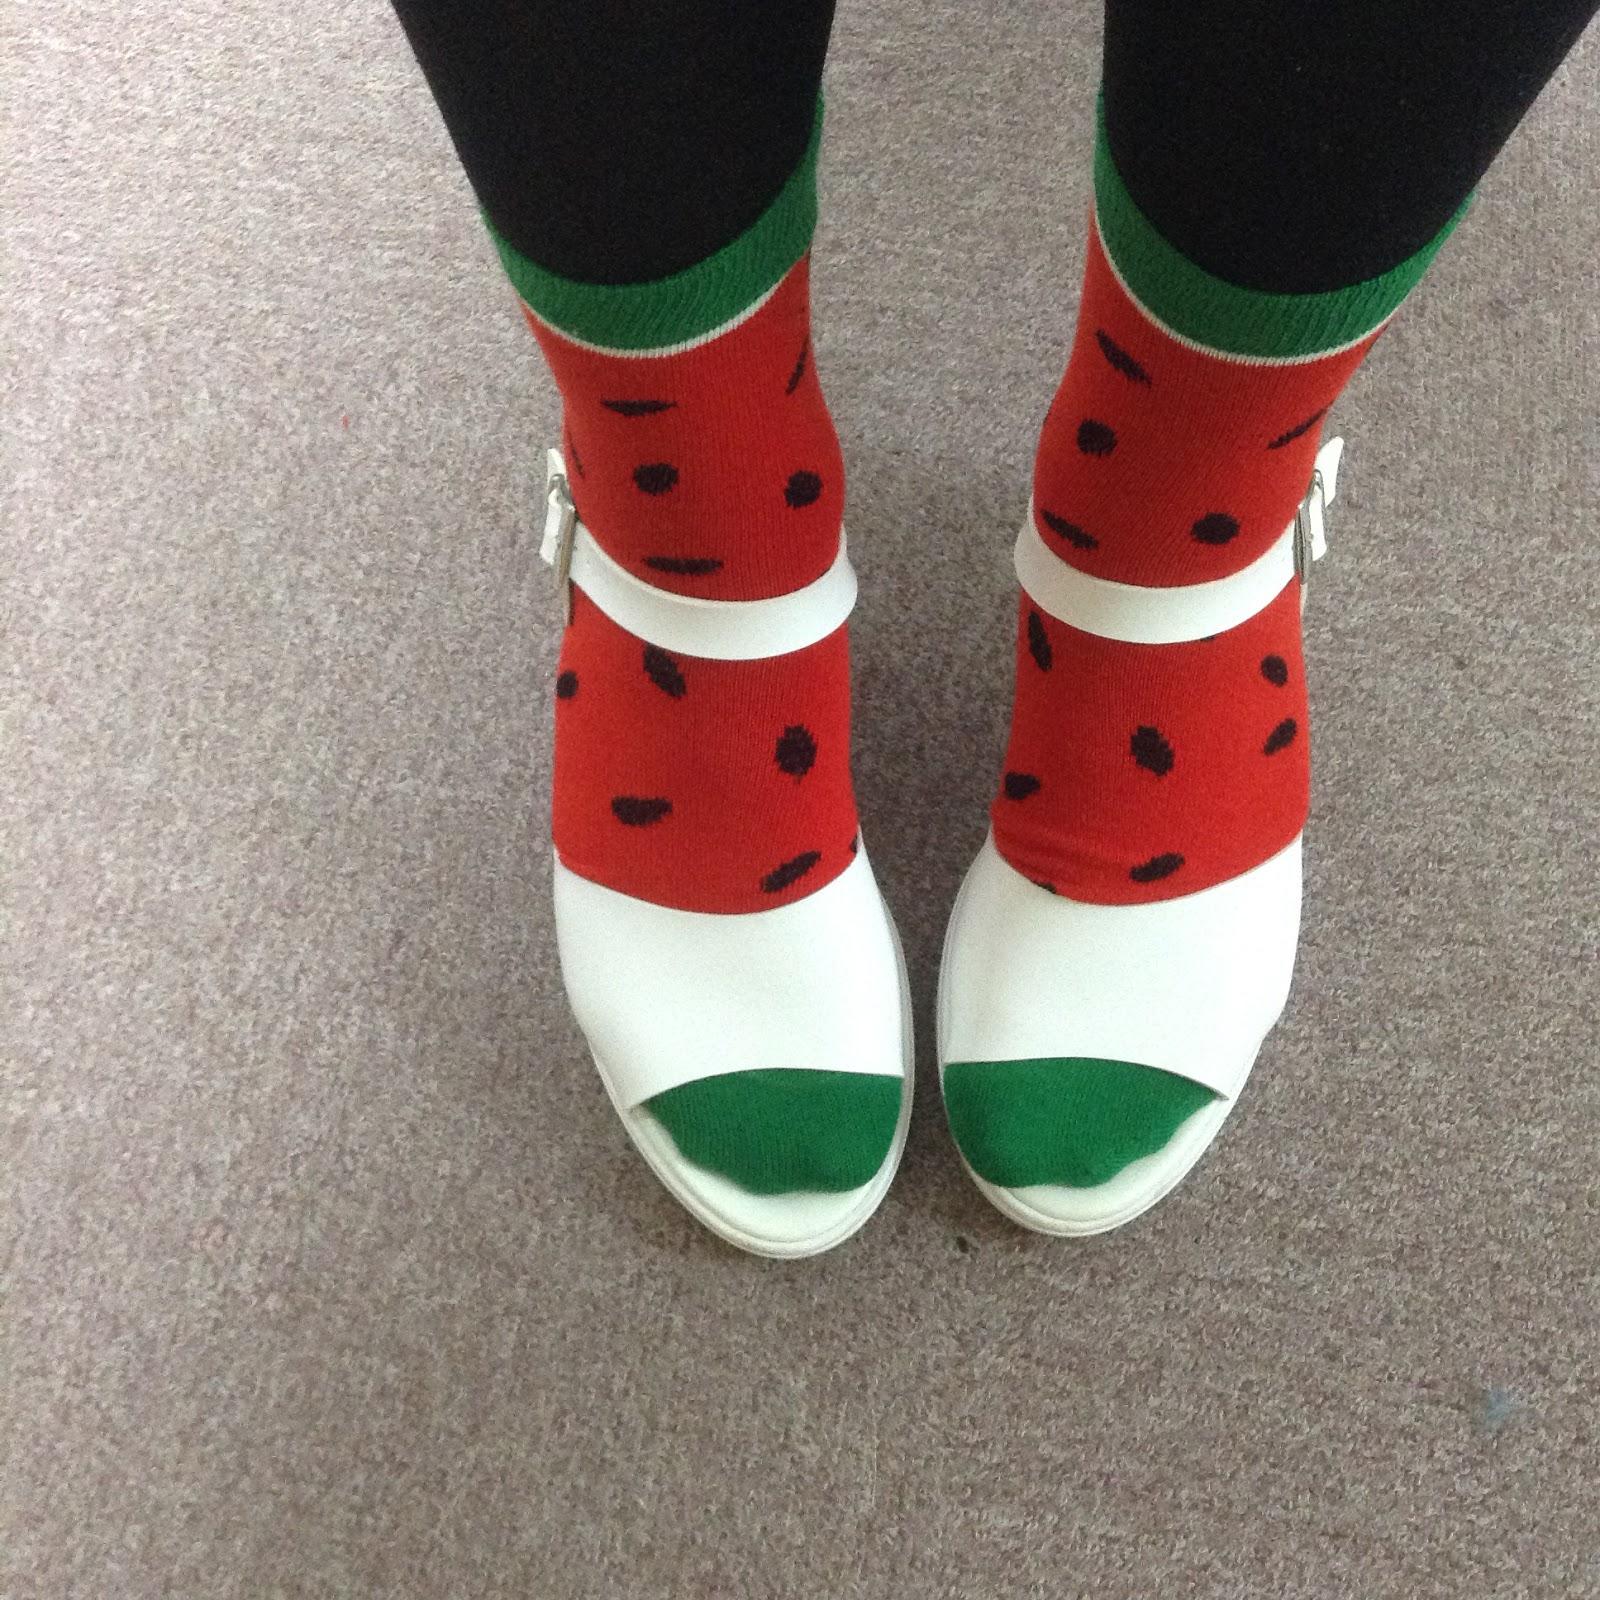 WEGO watermelon socks haul